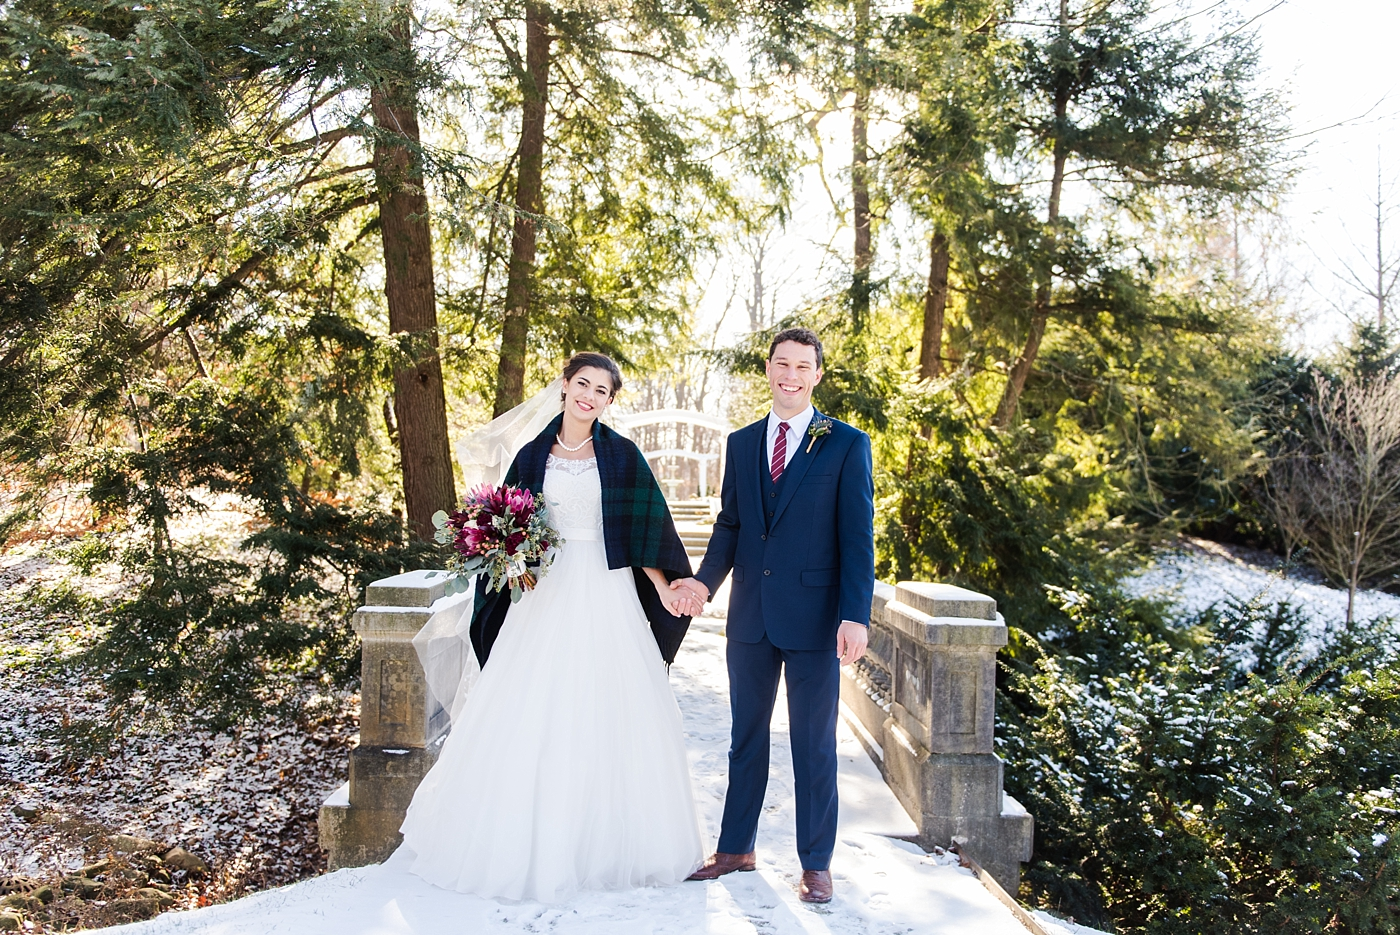 indianapolis-top-rated-wedding-photographers_0439.jpg